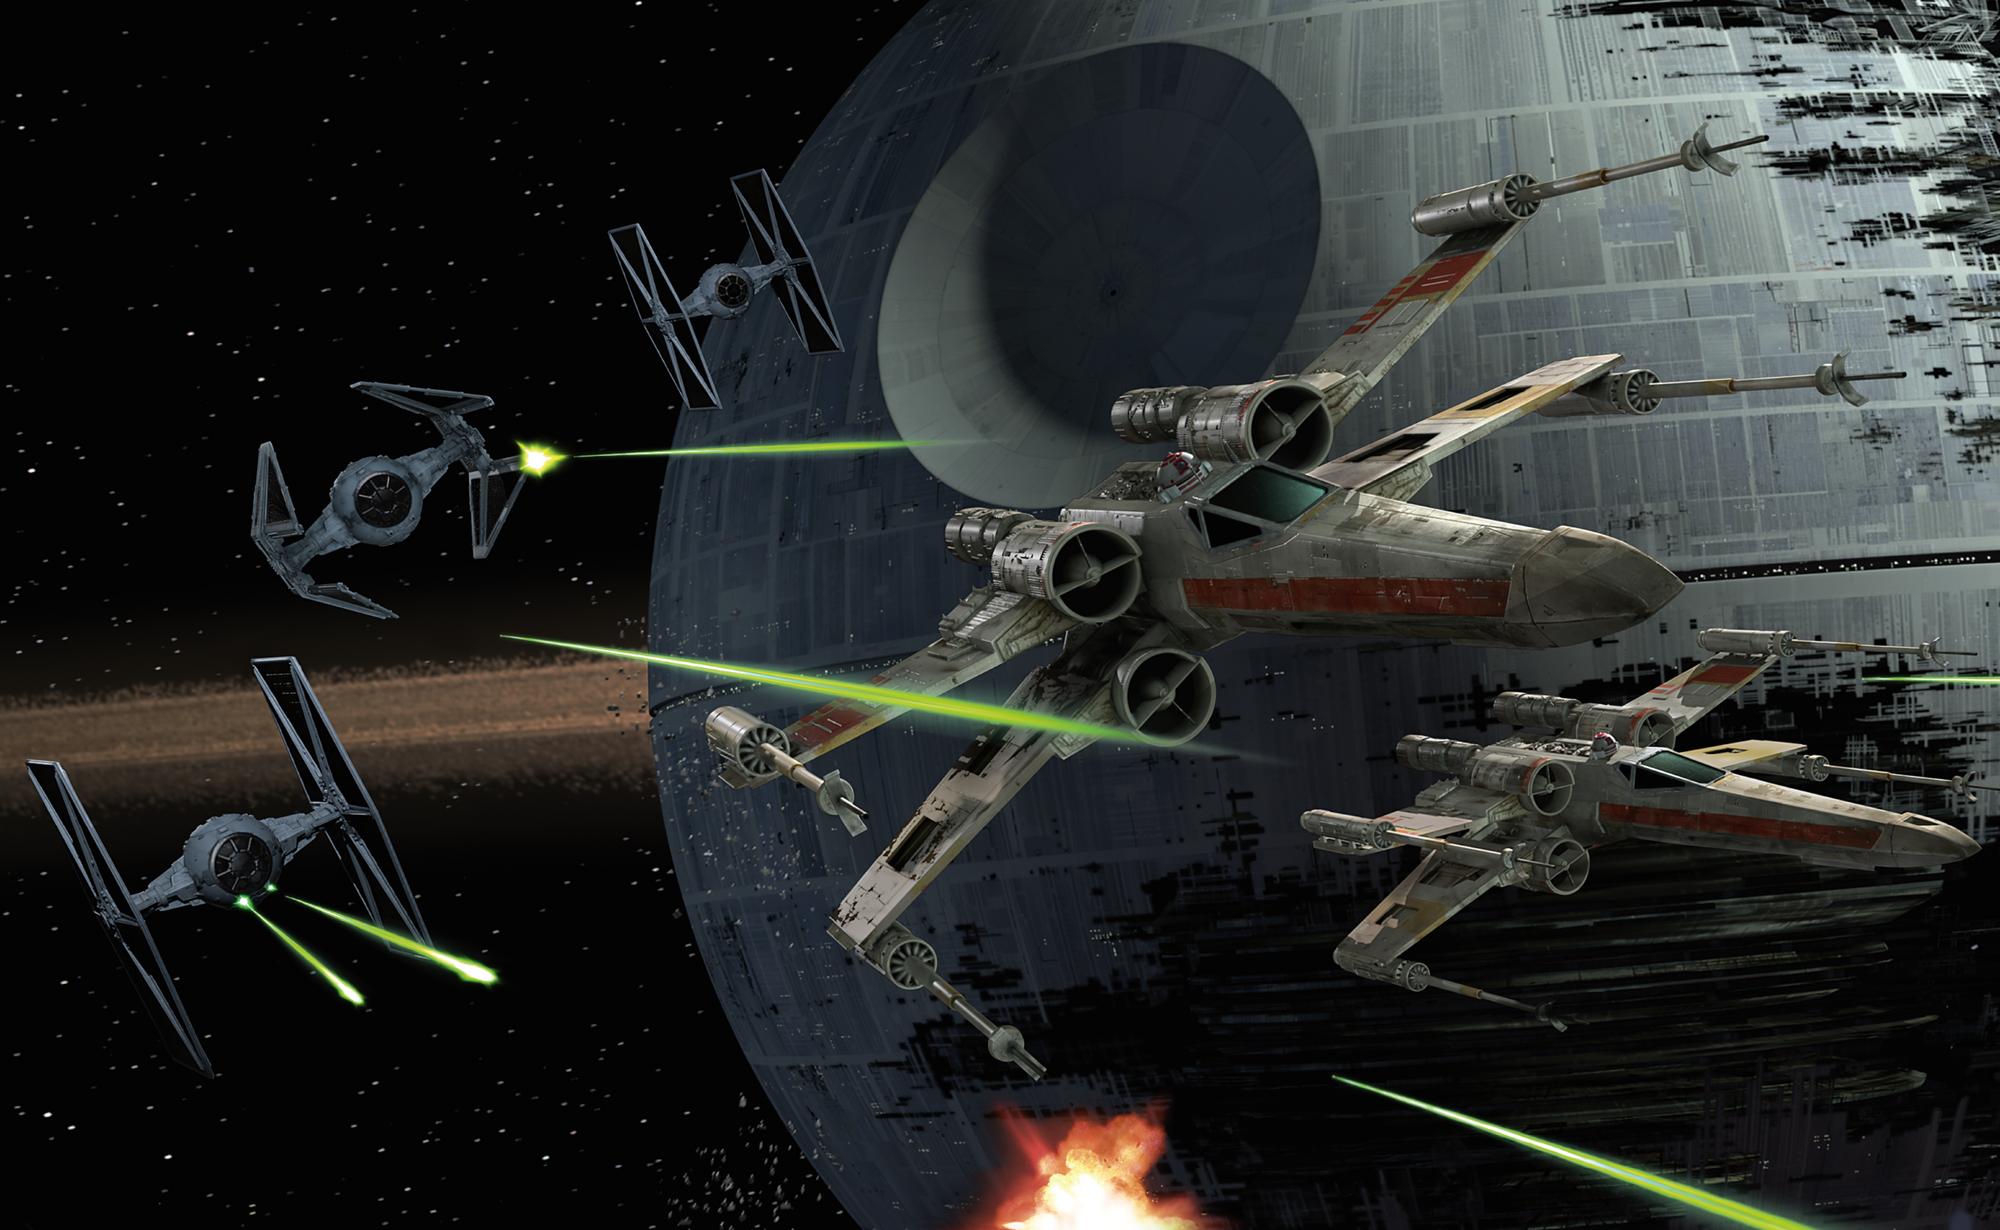 Starfighter combat | Wookieepedia | FANDOM powered by Wikia